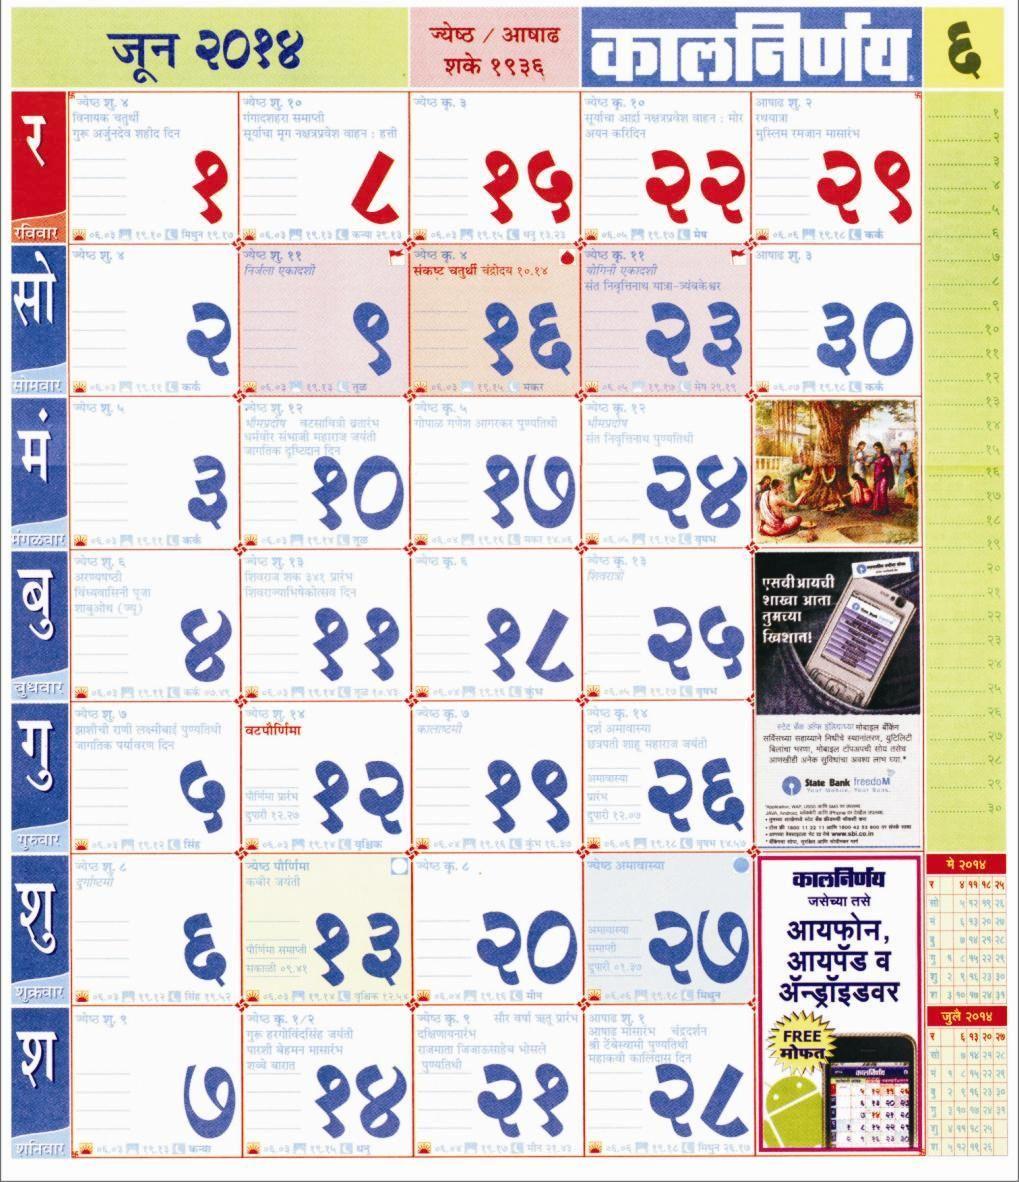 Kalnirnay 2014 Calendar on Pinterest | Calendar, November and December